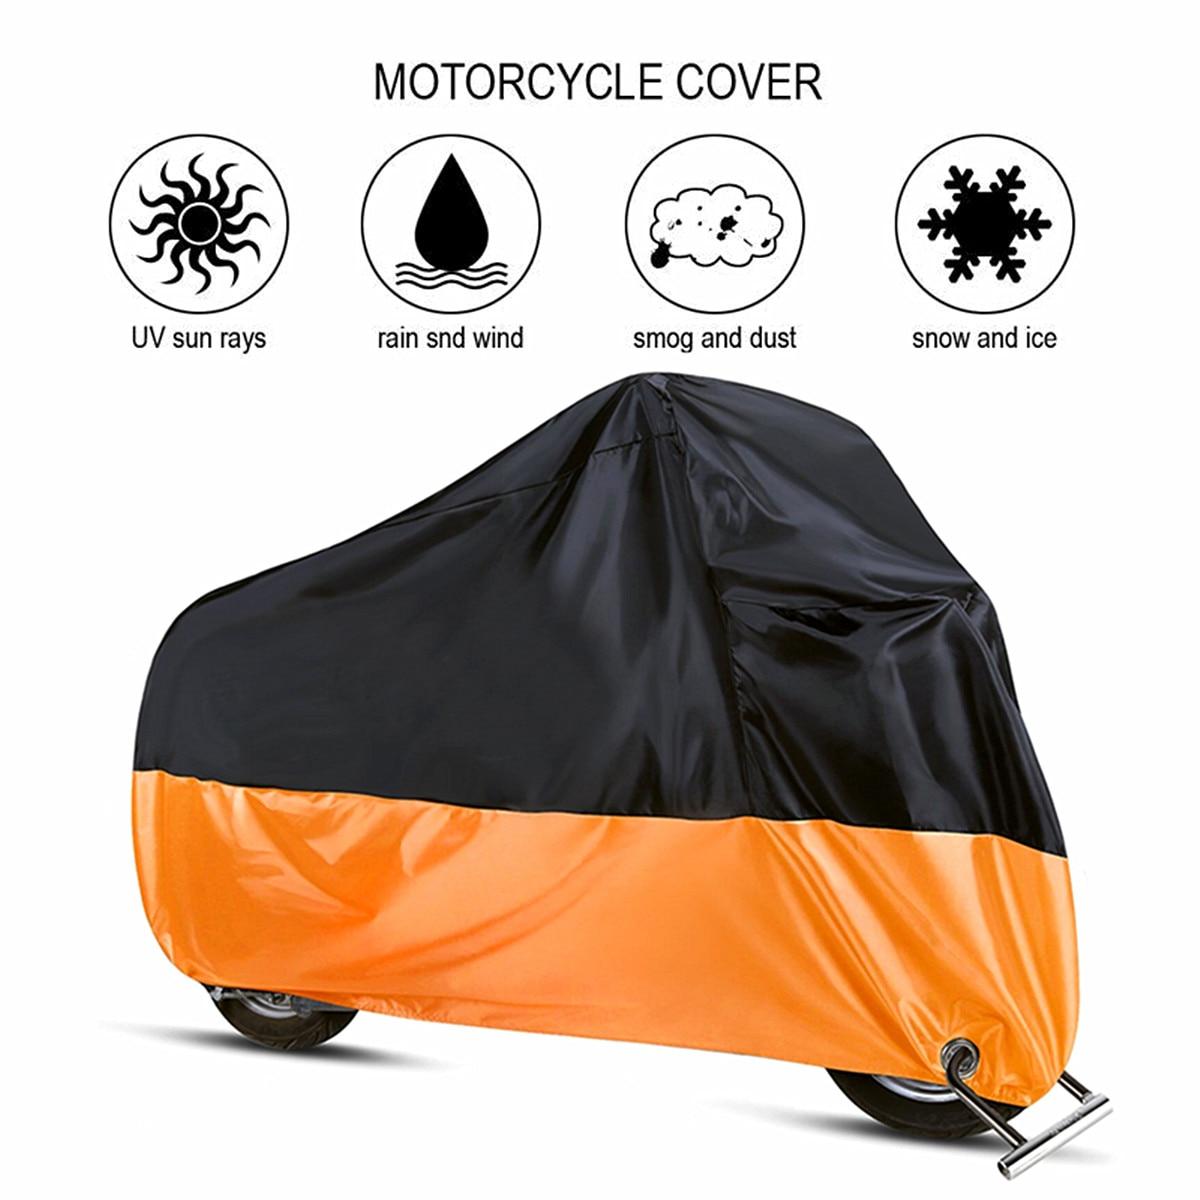 Waterproof Motorcycle Cover Protect Rain Dust UV Motocycle Case 190T Outdoor Motorbike Protector Elastic Hem L/XL/2XL/3XL/4XL